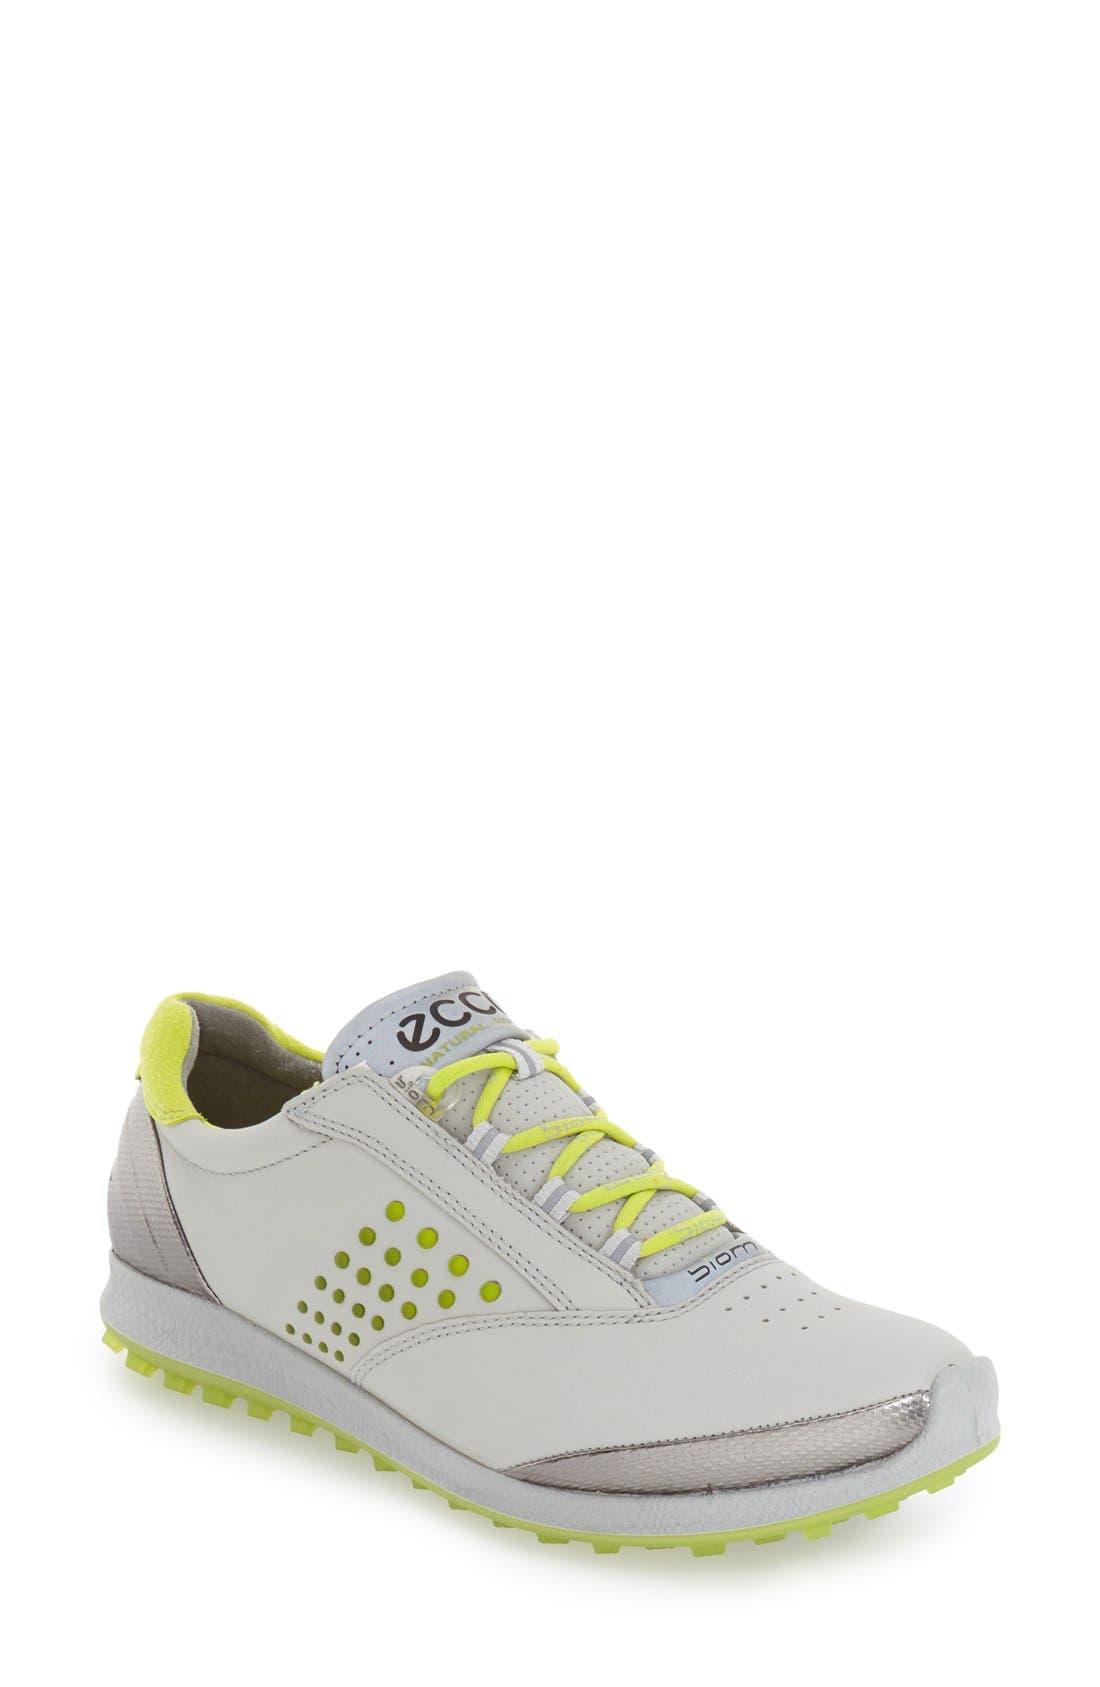 'BIOM' Hydromax<sup>®</sup> Waterproof Golf Shoe,                             Main thumbnail 3, color,